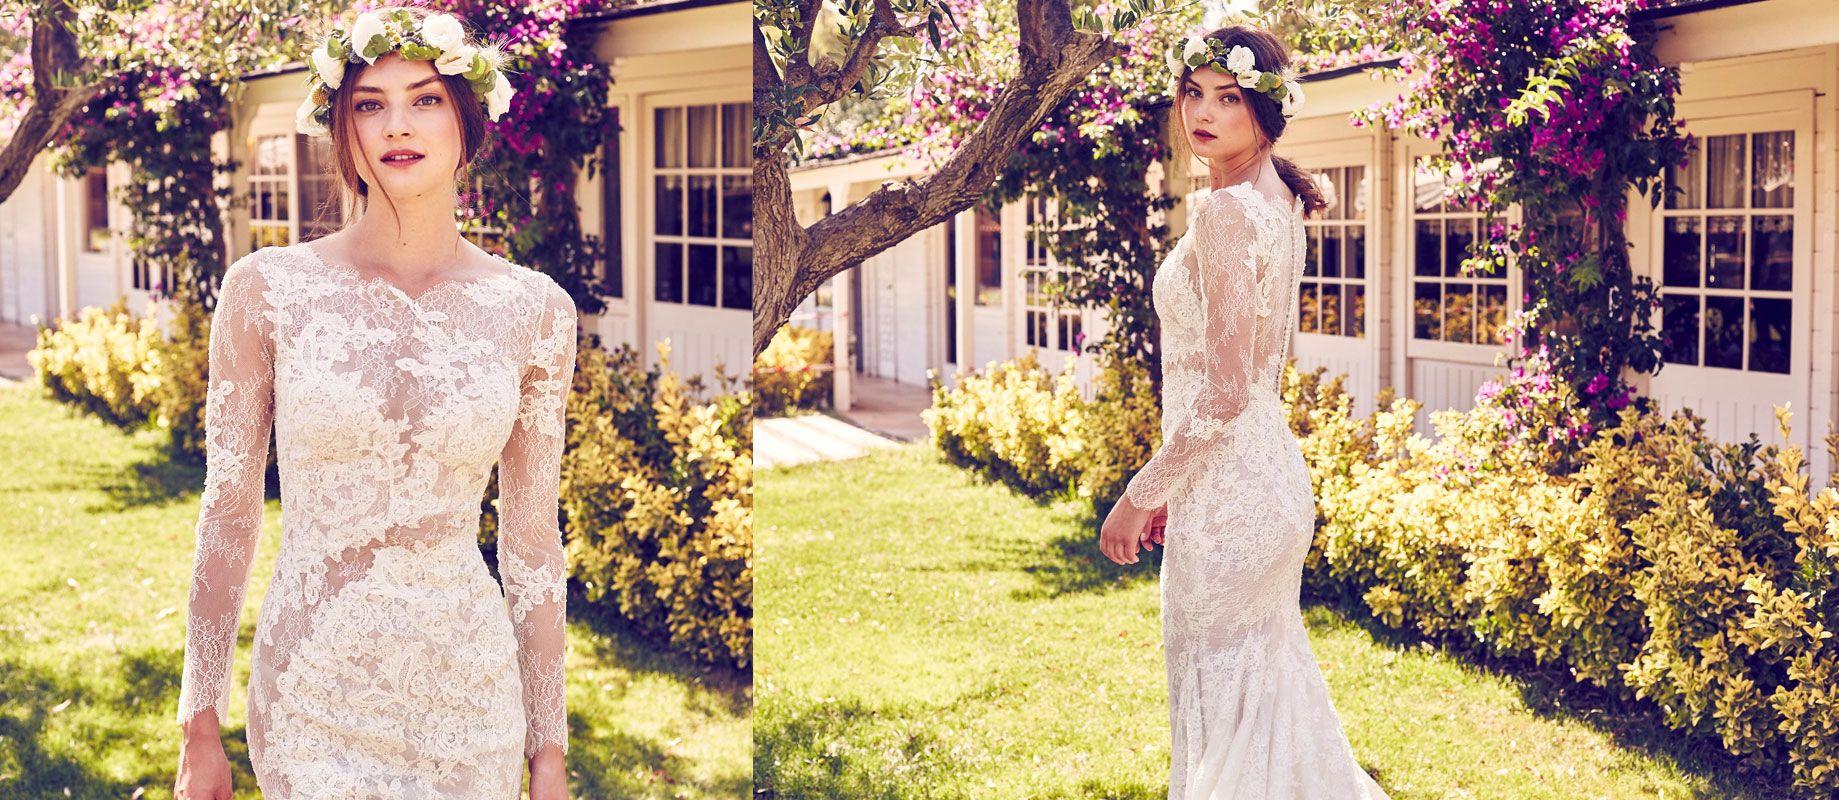 Wedding dresses cheap los angeles  Wedding Dress Los Angeles  Los Angeles Bridal Salon  Beautiful Day